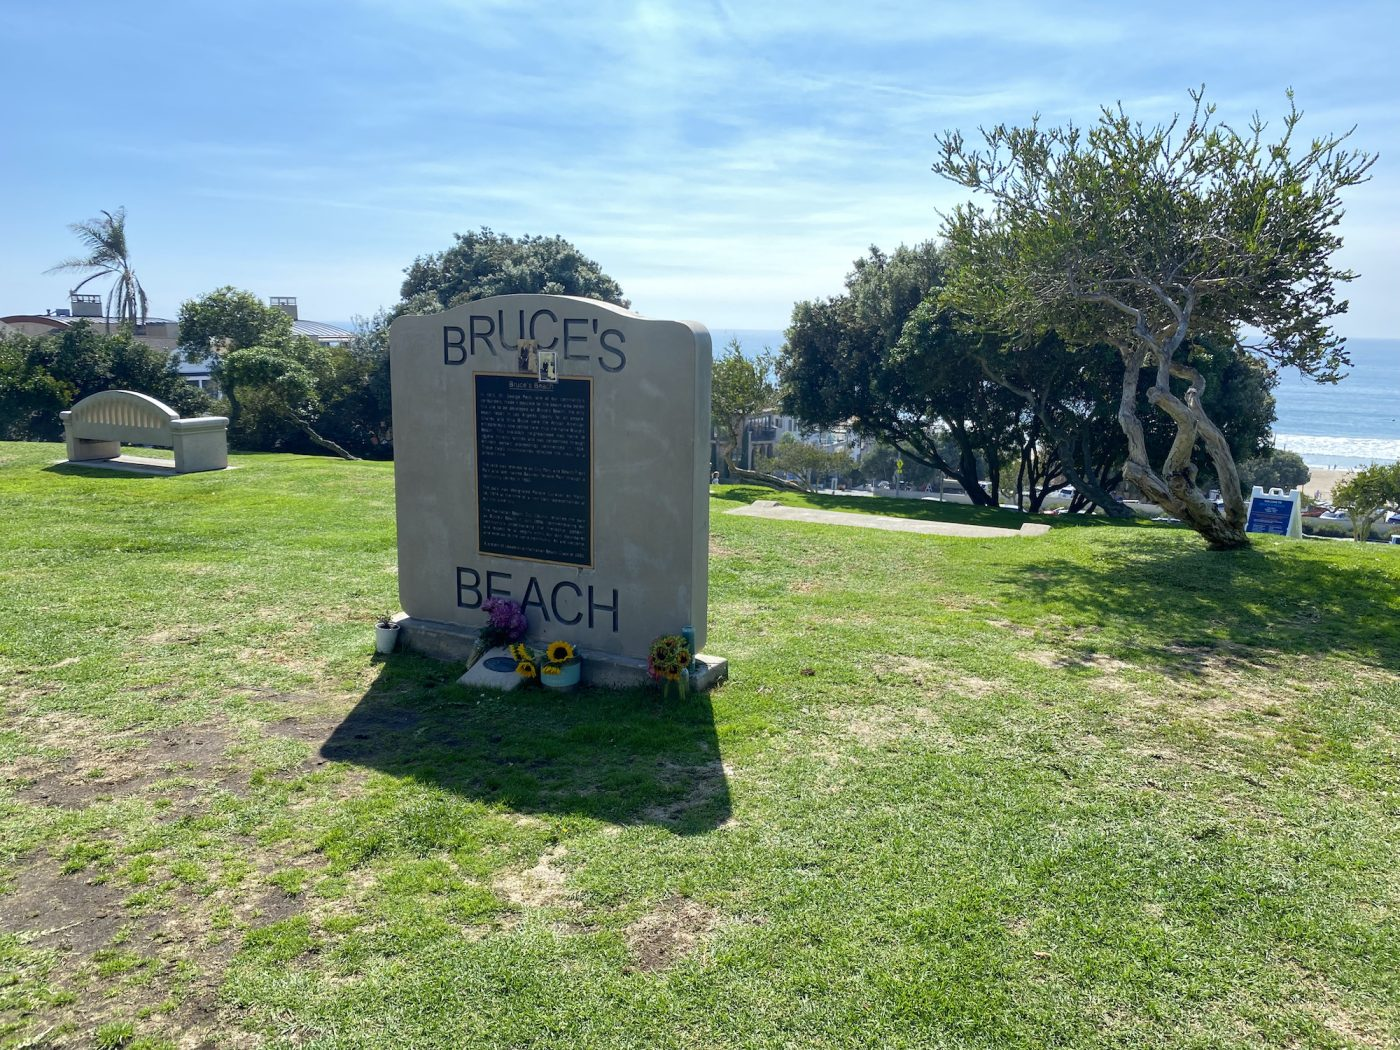 Bruce's Beach was an oasis for Black beachgoers a century ago. (Brandon I. Brooks/L.A. Sentinel)